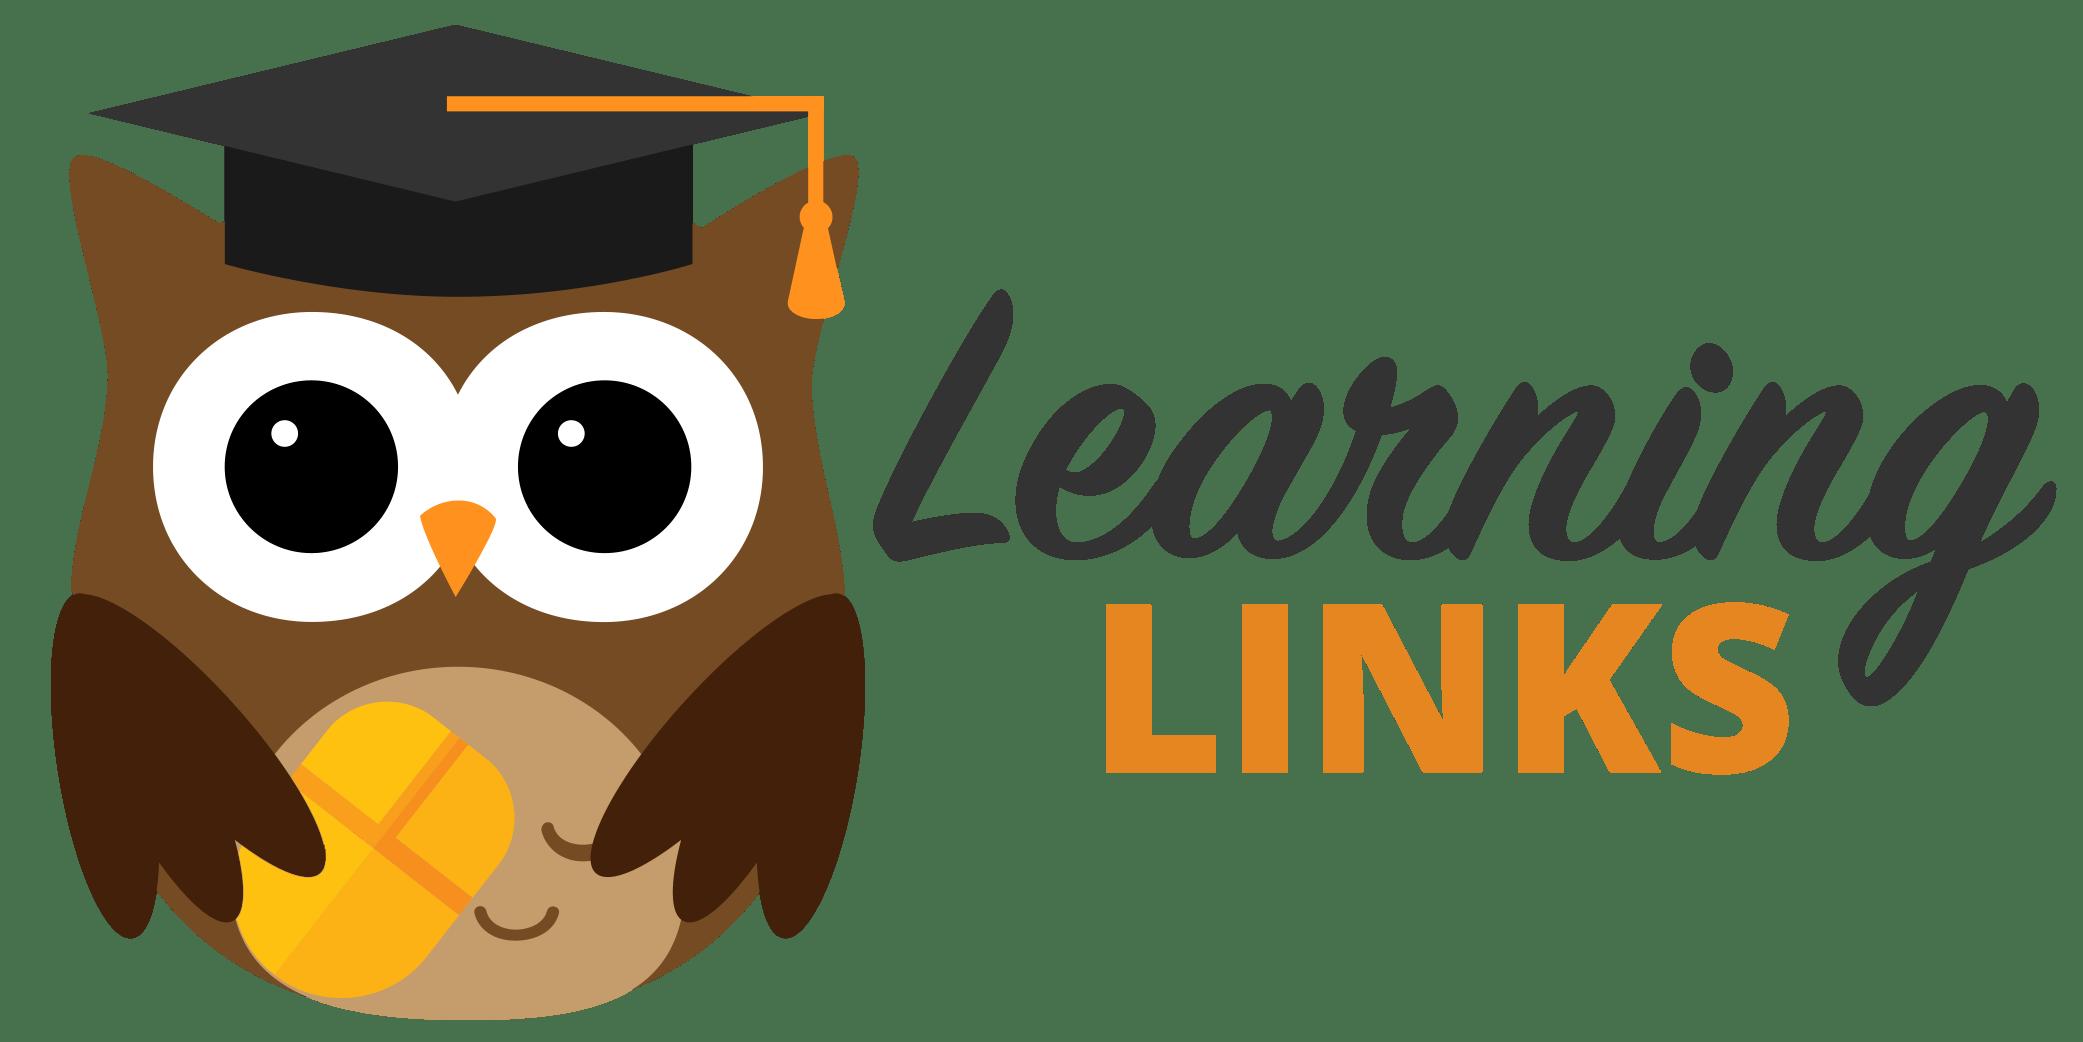 JES Learning Links